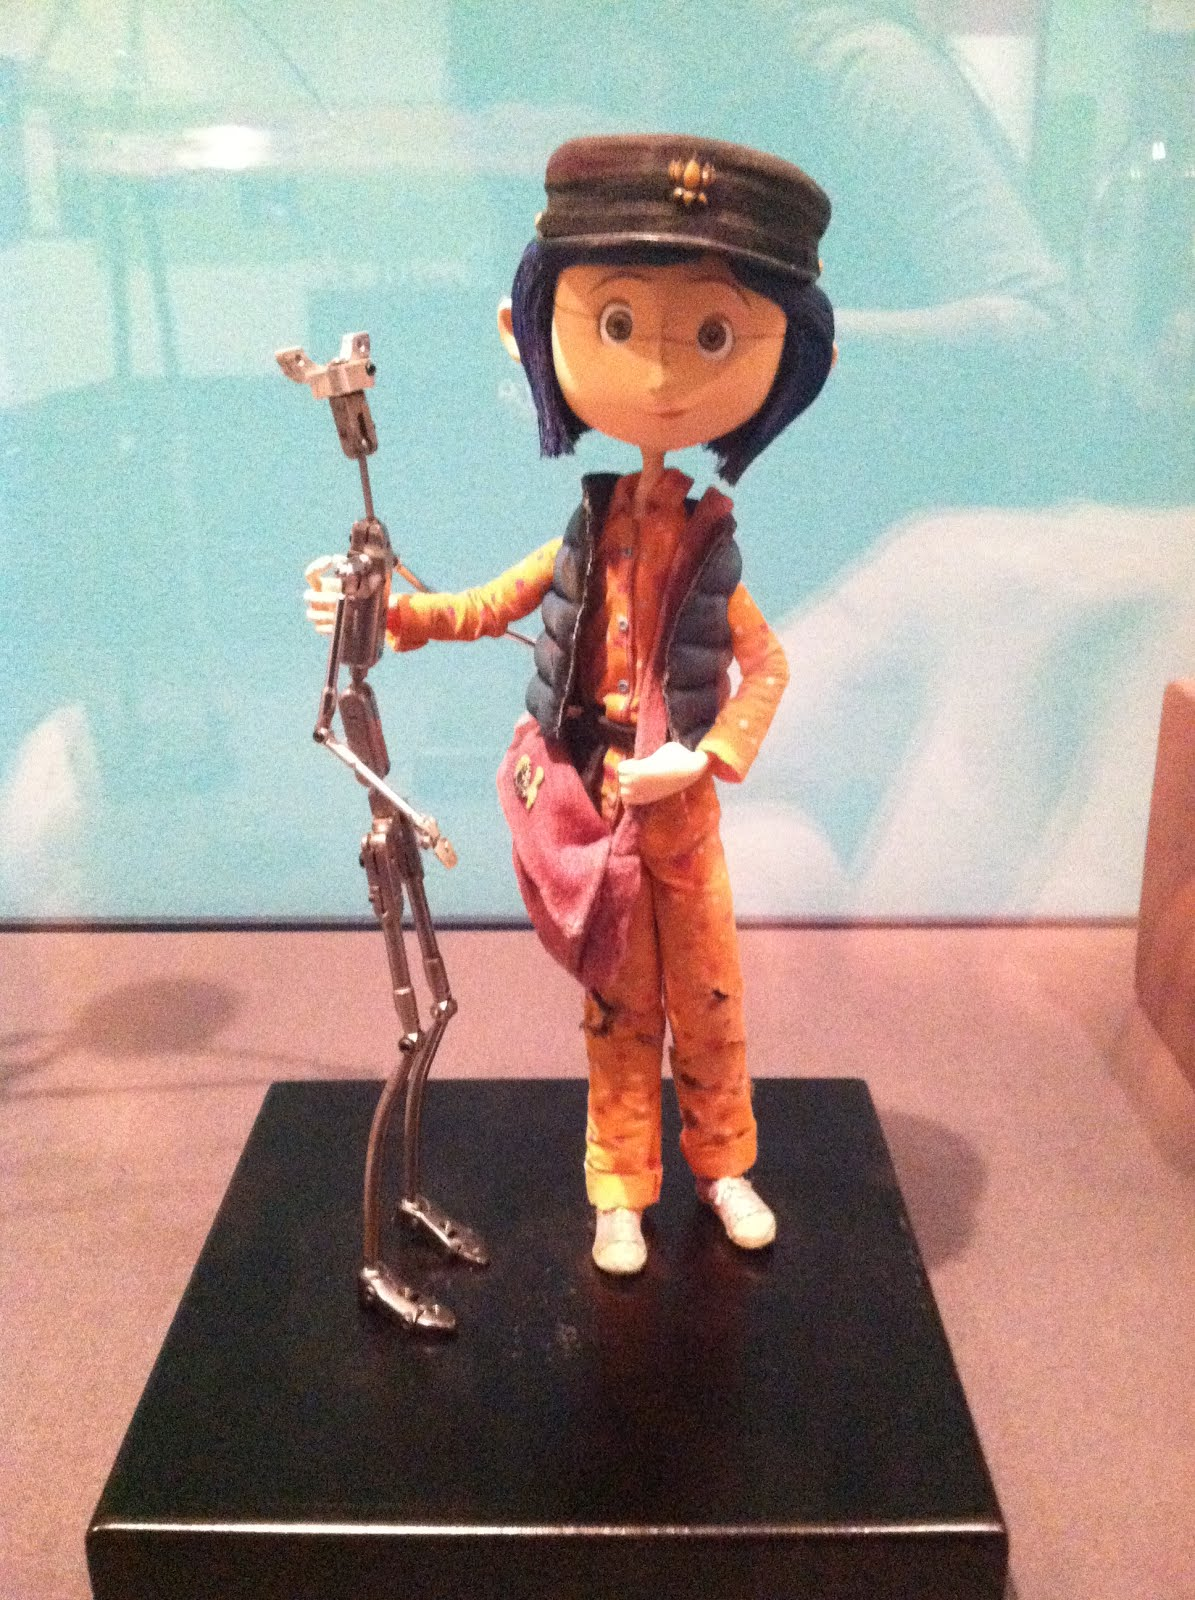 Patisse Serie Paranorman Art At The Cartoon Art Museum